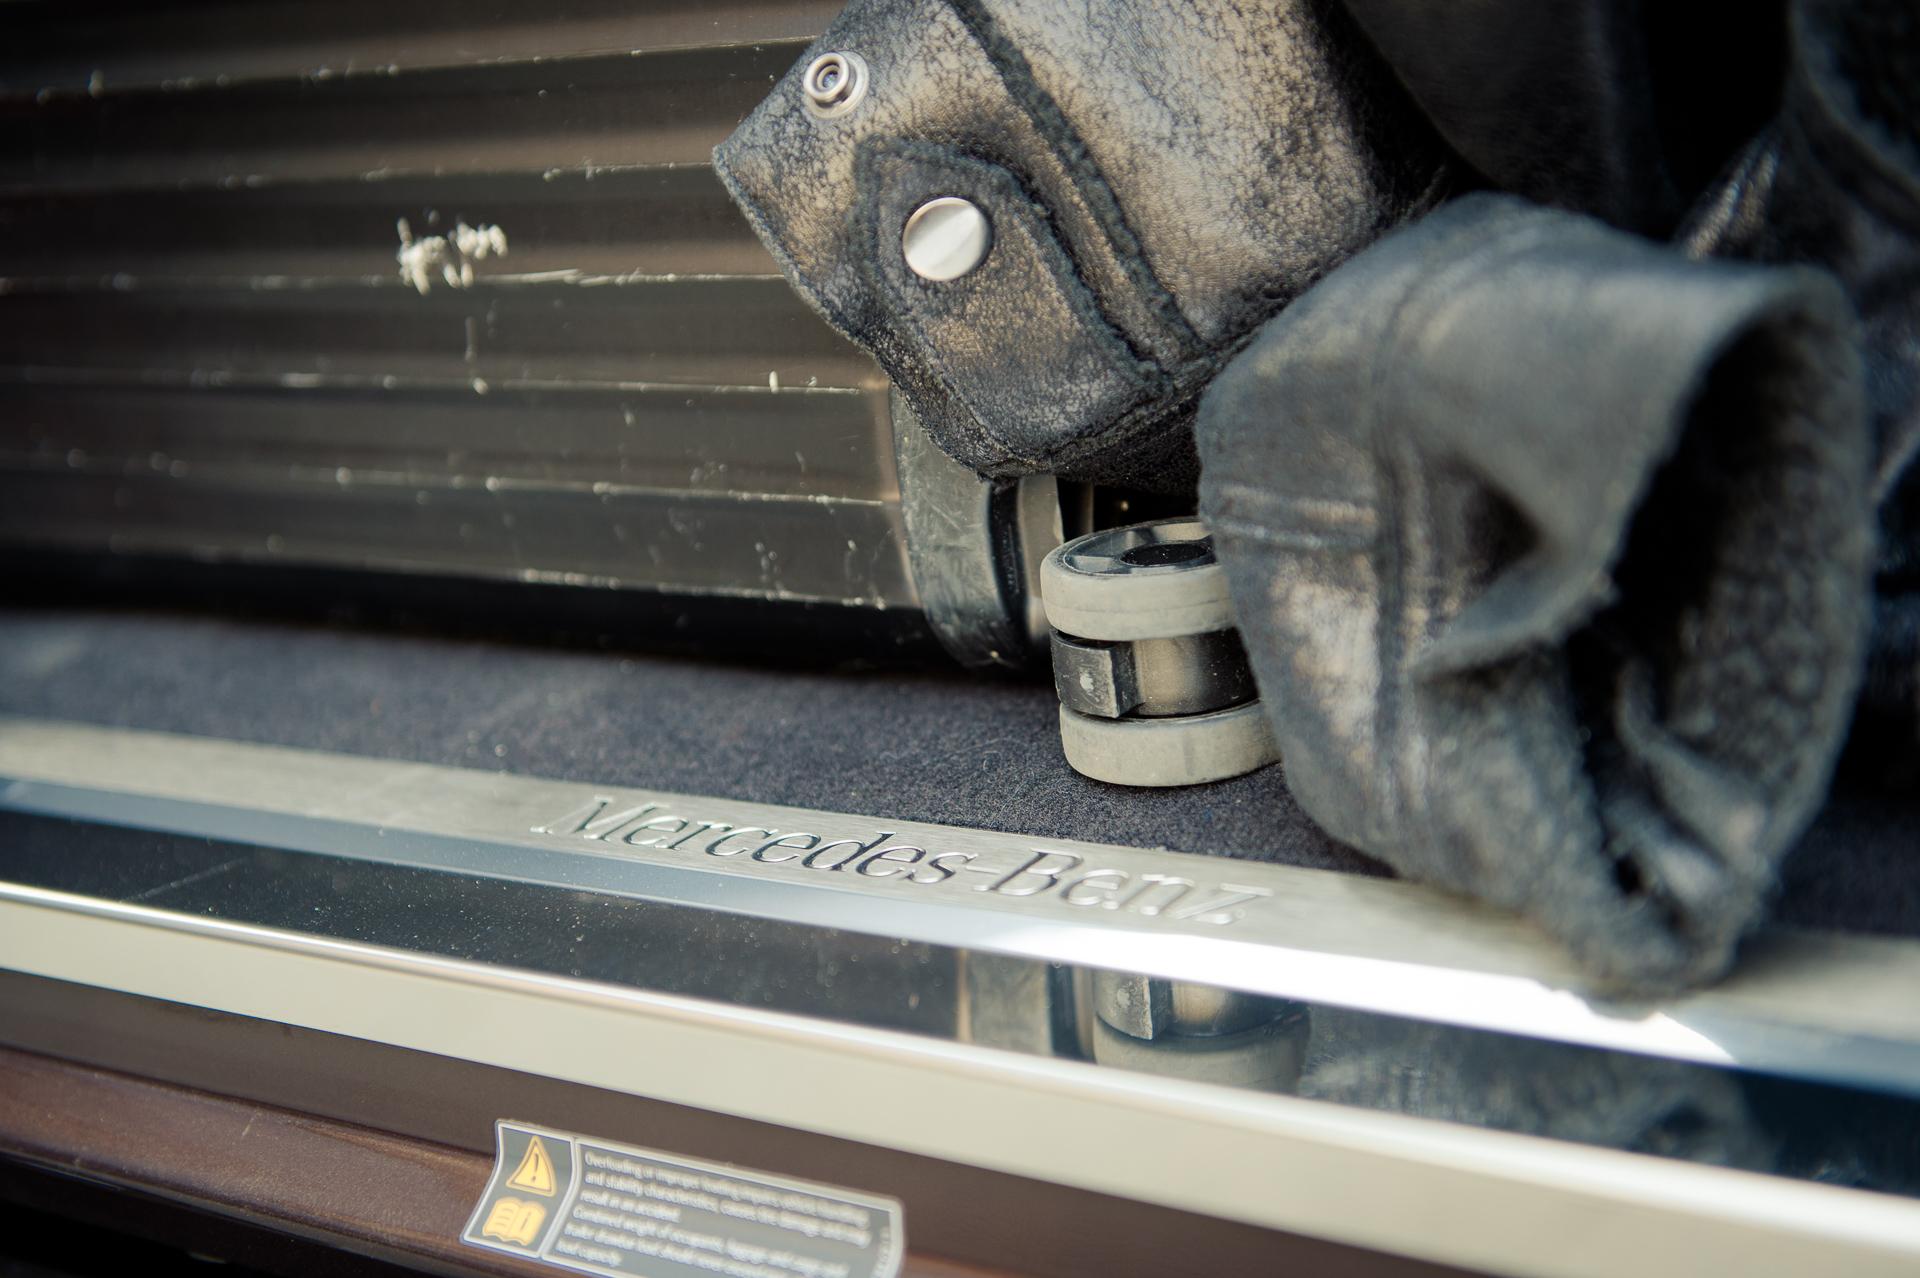 2014-Mercedes-Benz-G500-G550-braun-Kalifornien-mbrt14-30